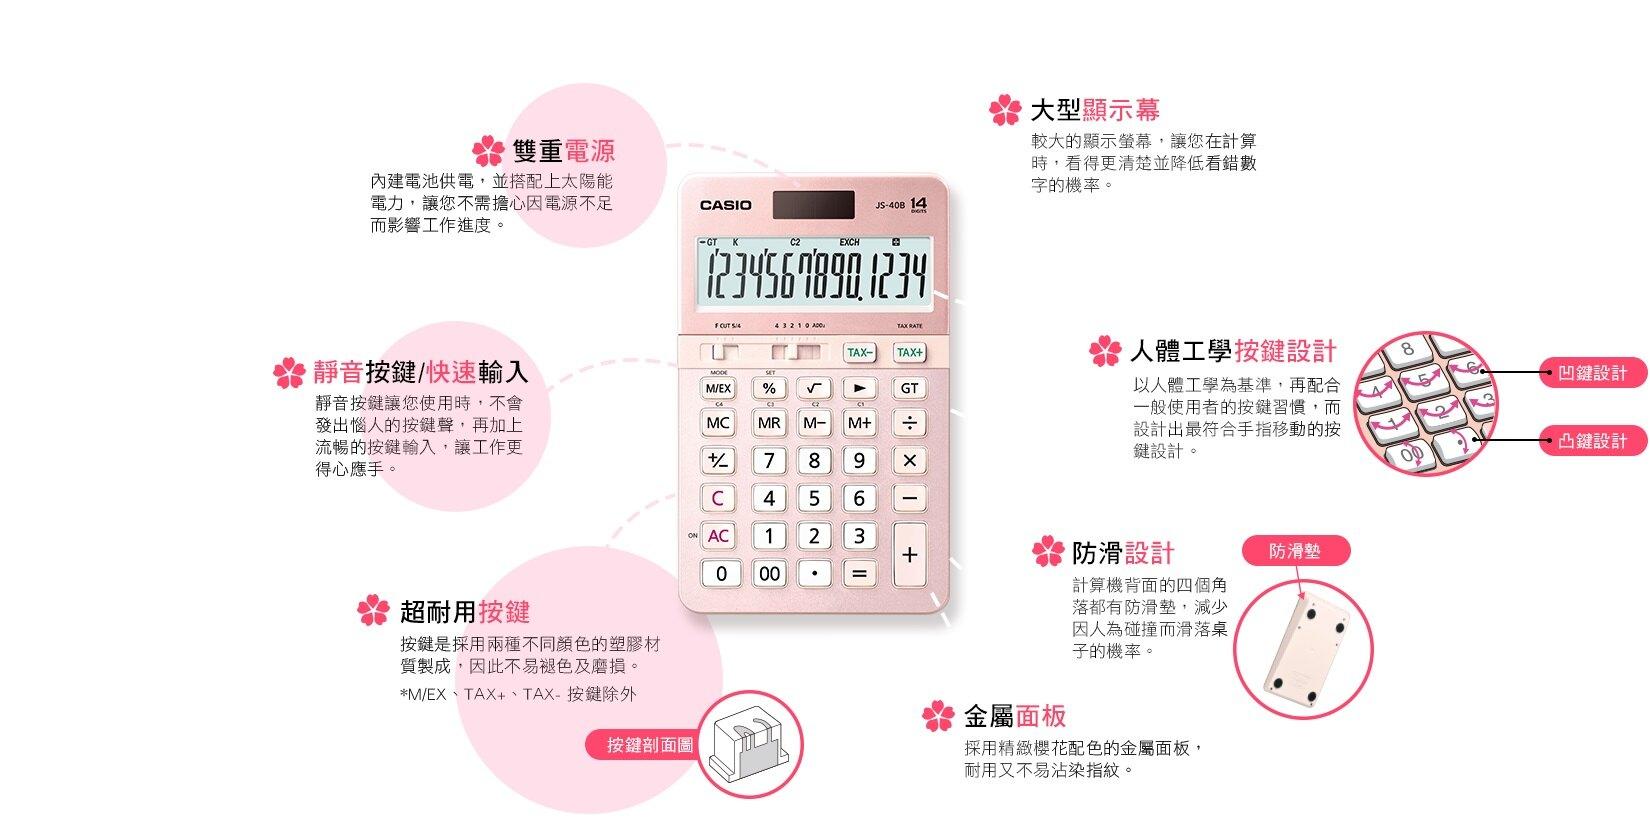 CASIO JS-40B-PK 櫻花機 公司貨保固兩年~現貨供應中